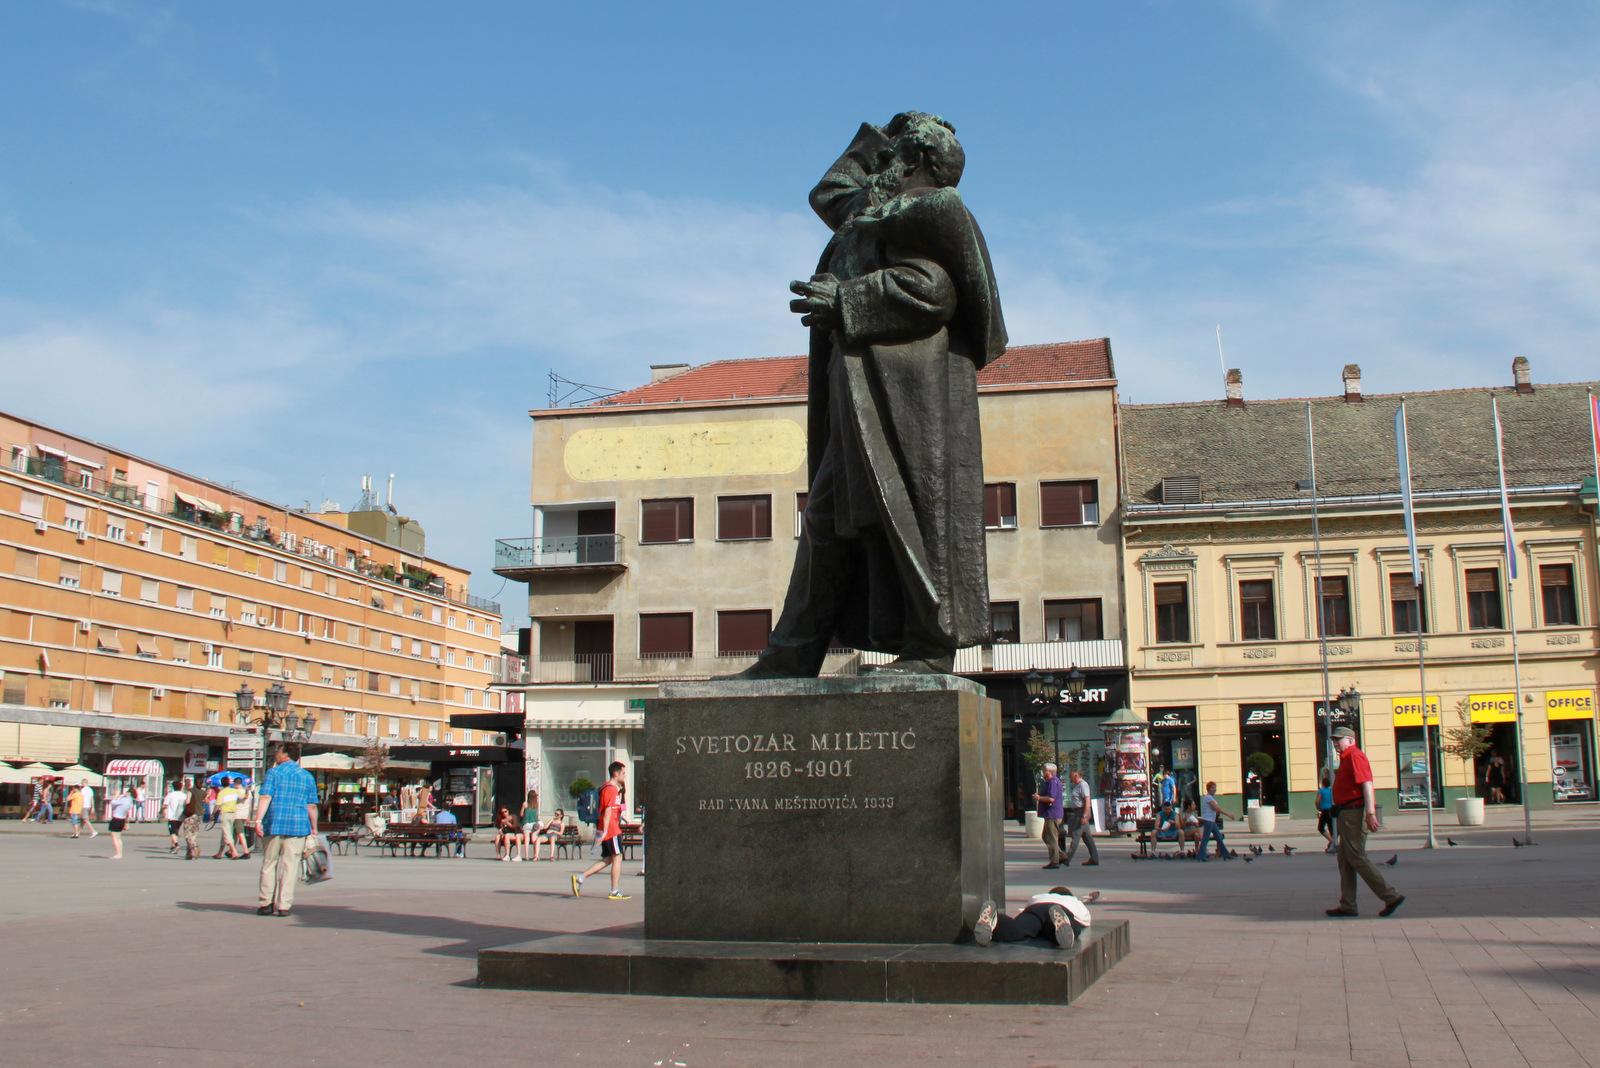 Spomenik Svetozarju Miletiću